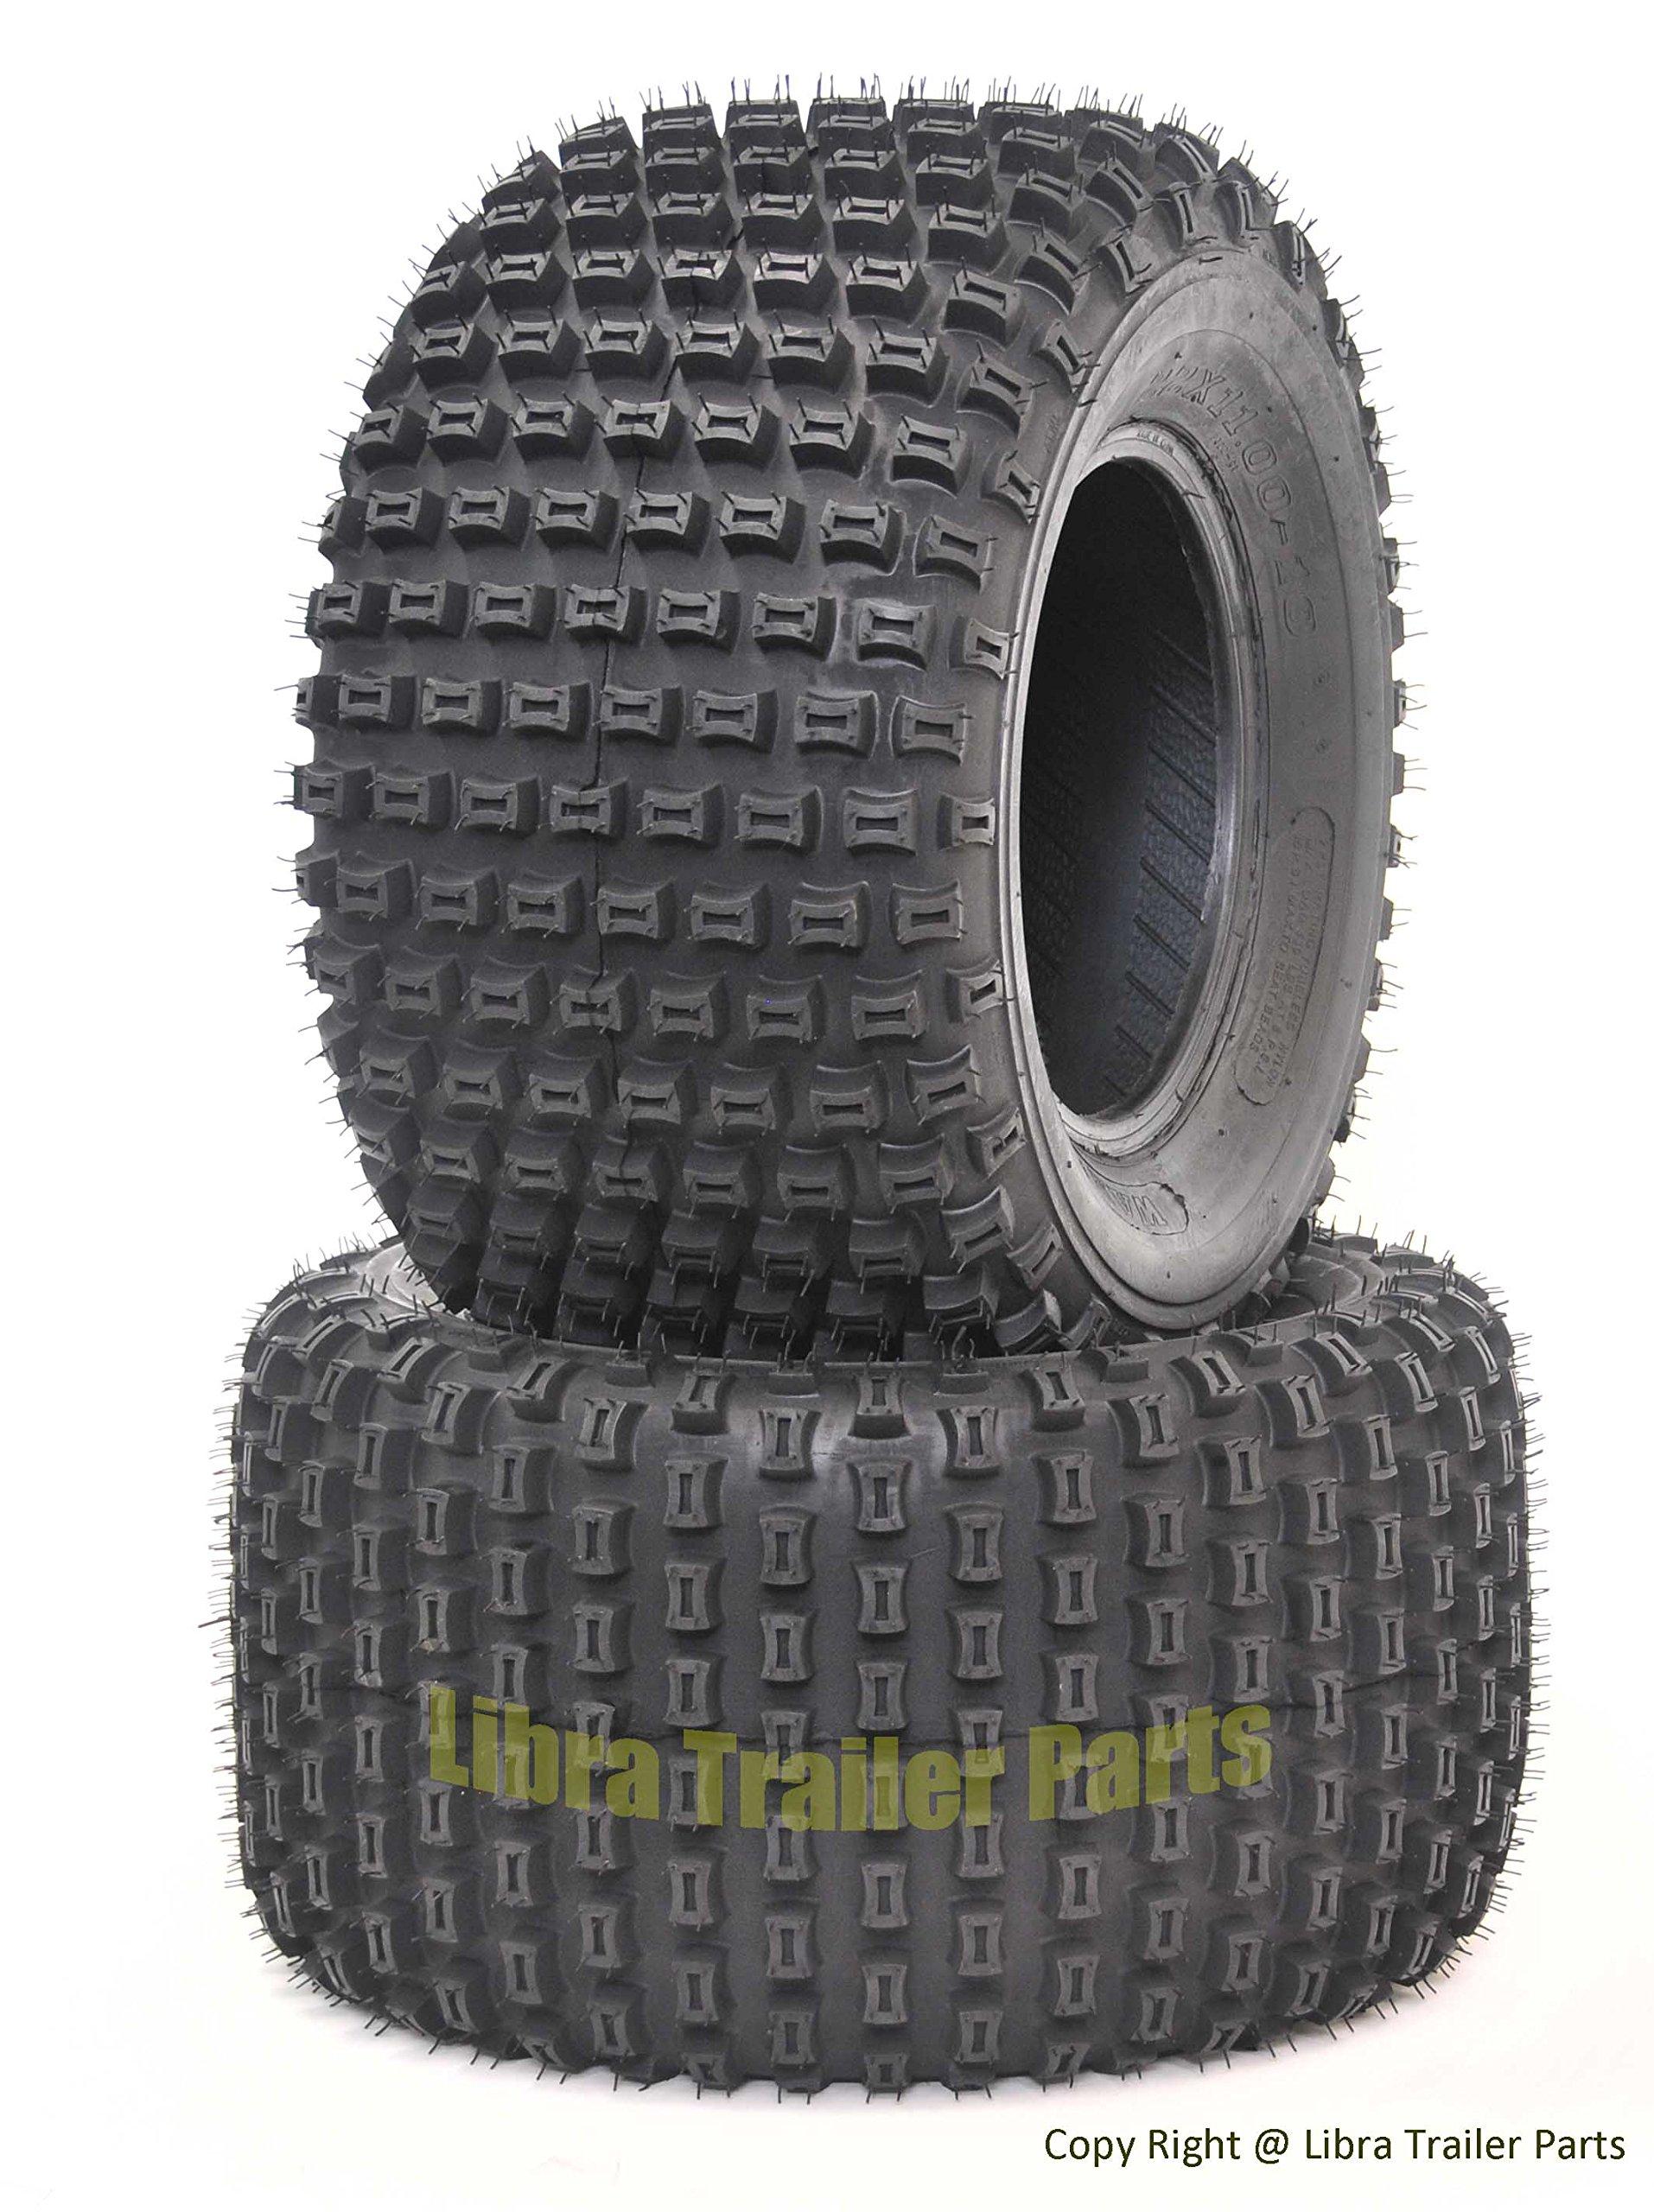 2 New WANDA ATV Tires 22X11-10 4PR P322 Dimple Knobby - 10029